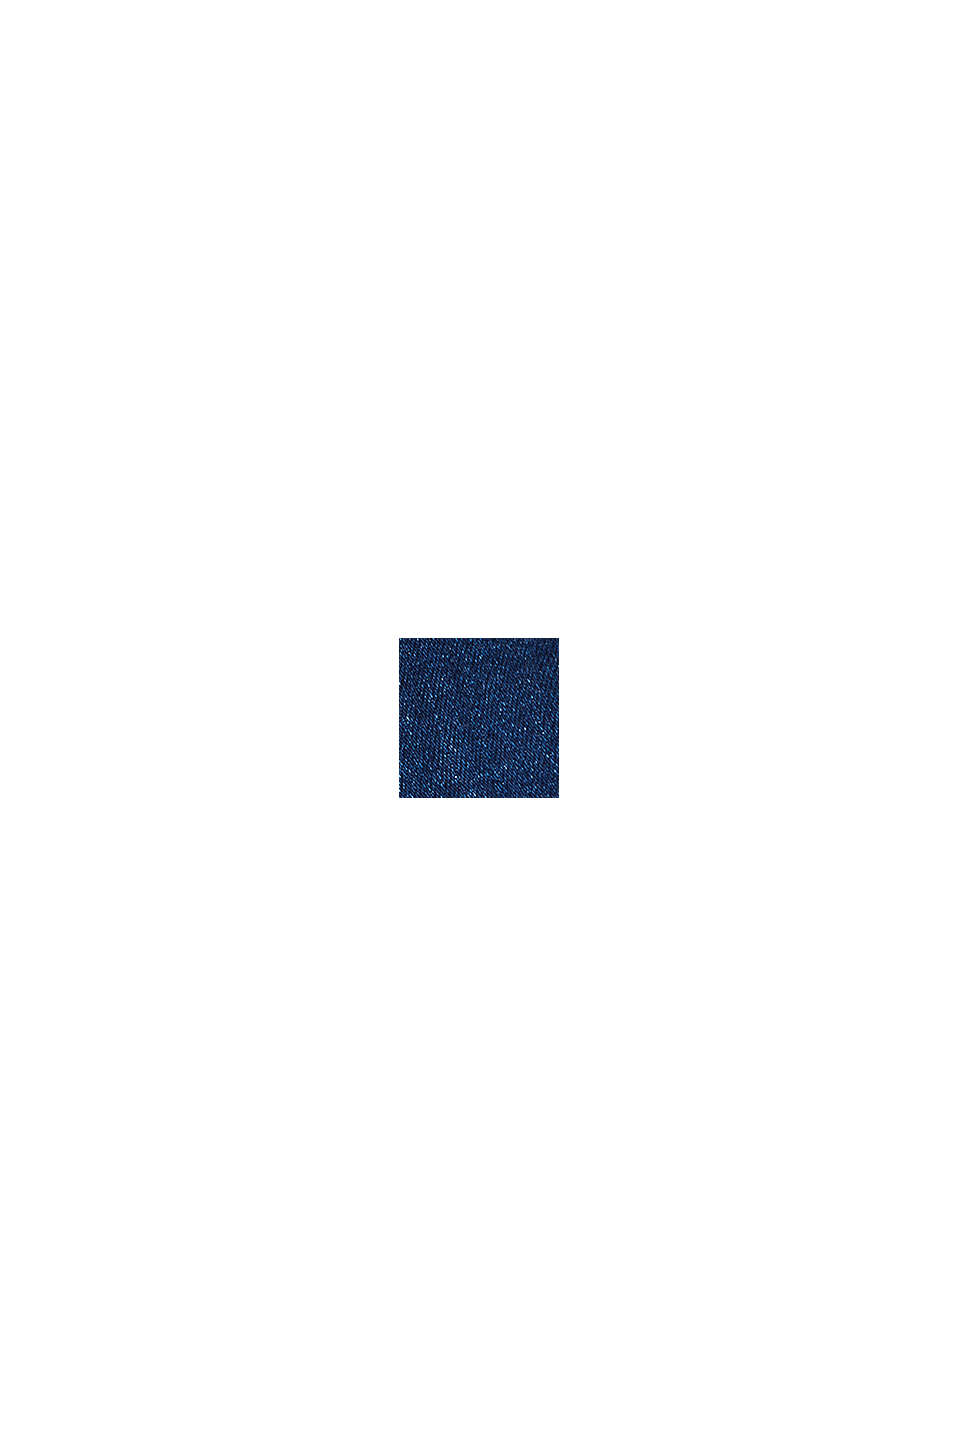 Jeans capri stretch con fondo fascia premaman, BLUE DARK WASHED, swatch